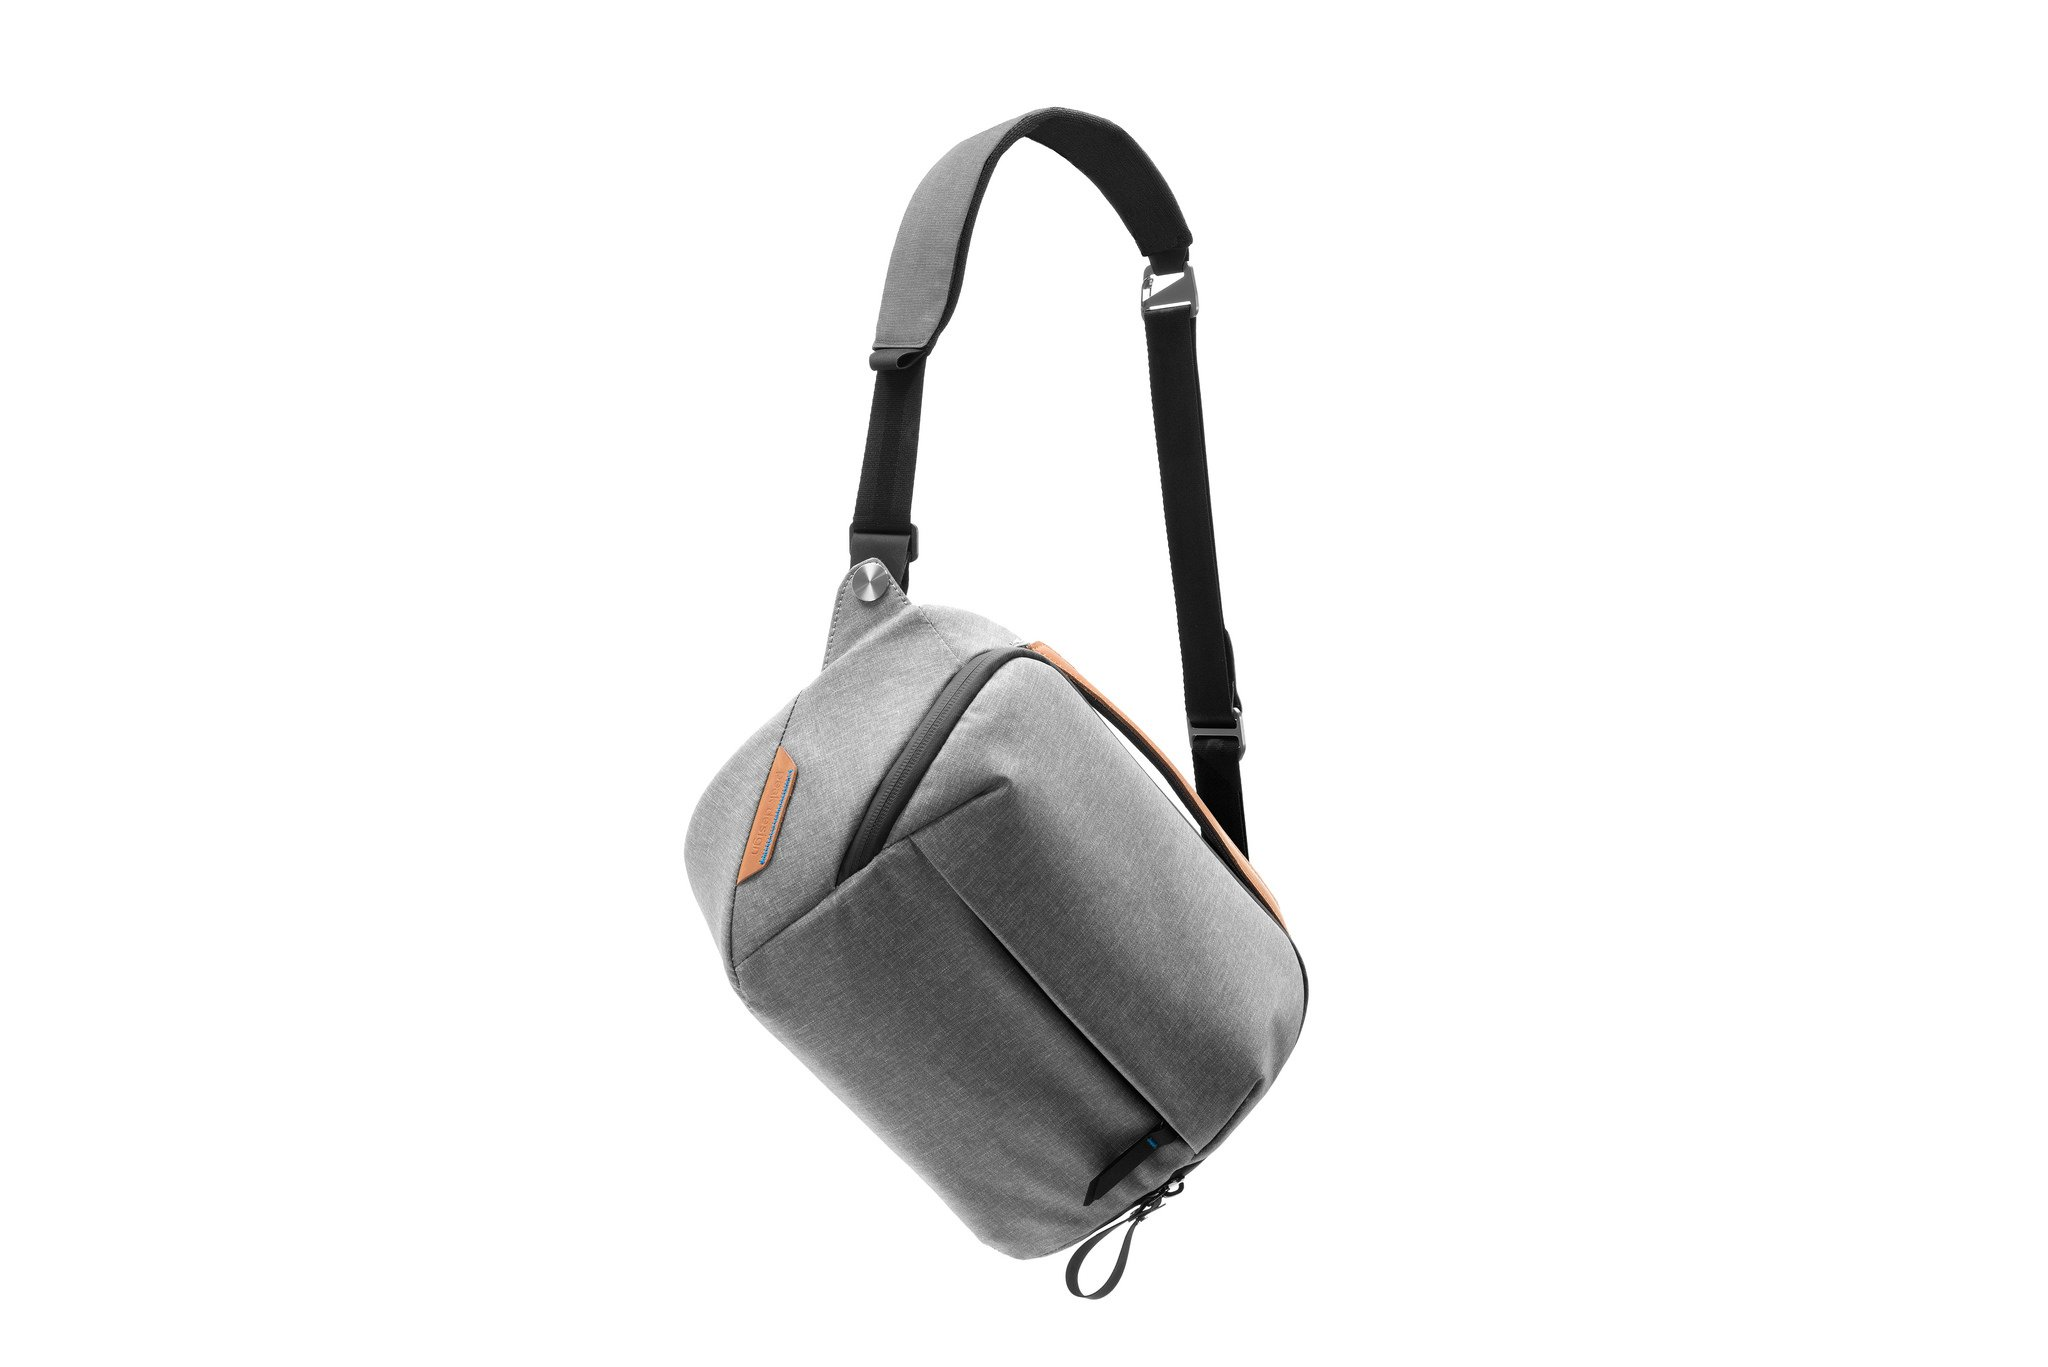 Peak Design Everyday Sling 5L (Ash Camera Bag) by Peak Design